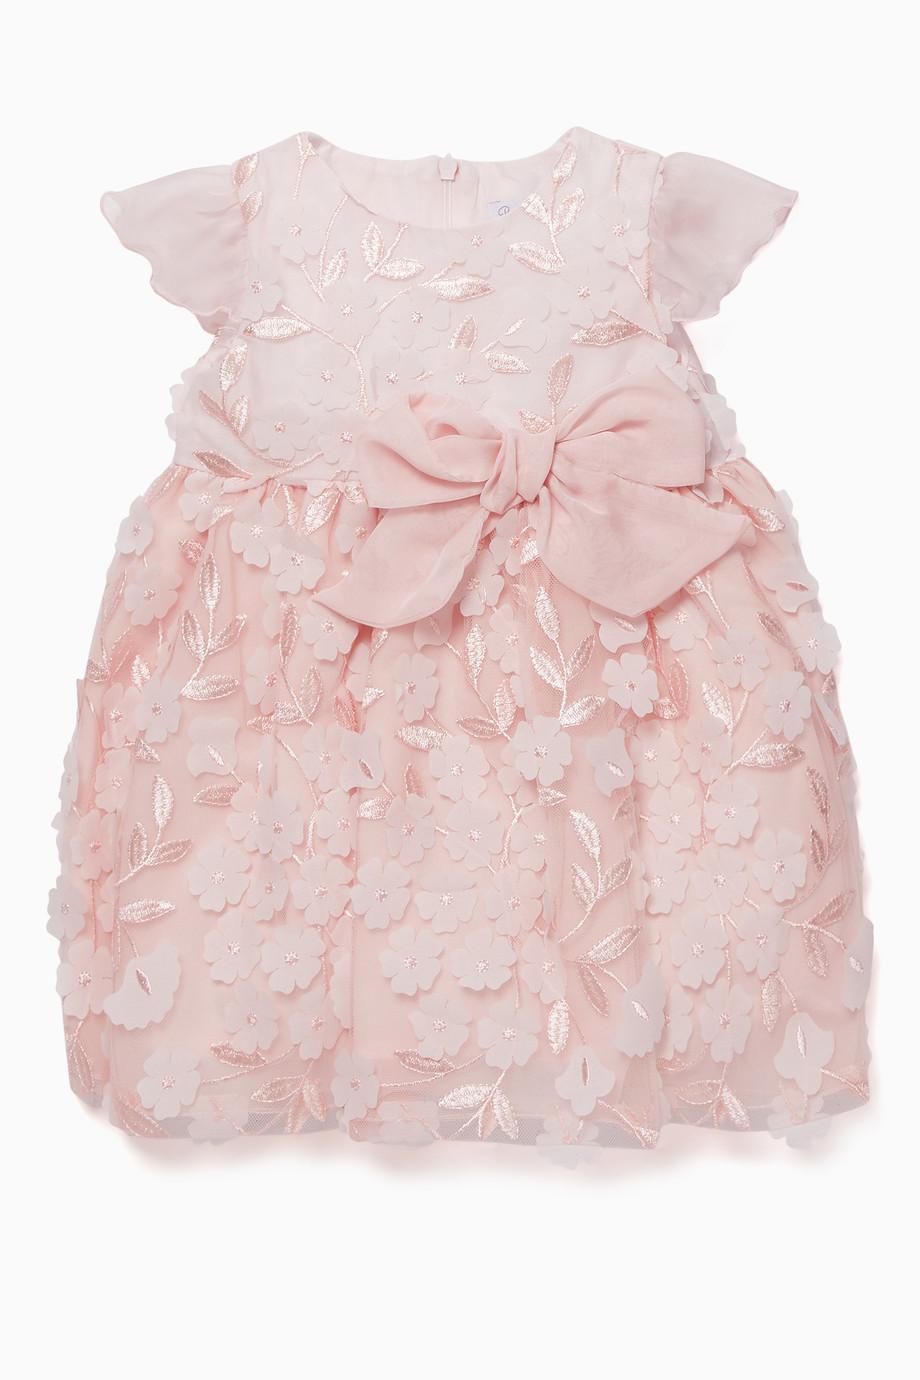 40adabdafd9 Shop Patachou Pink Flower Appliqué Dress for Kids